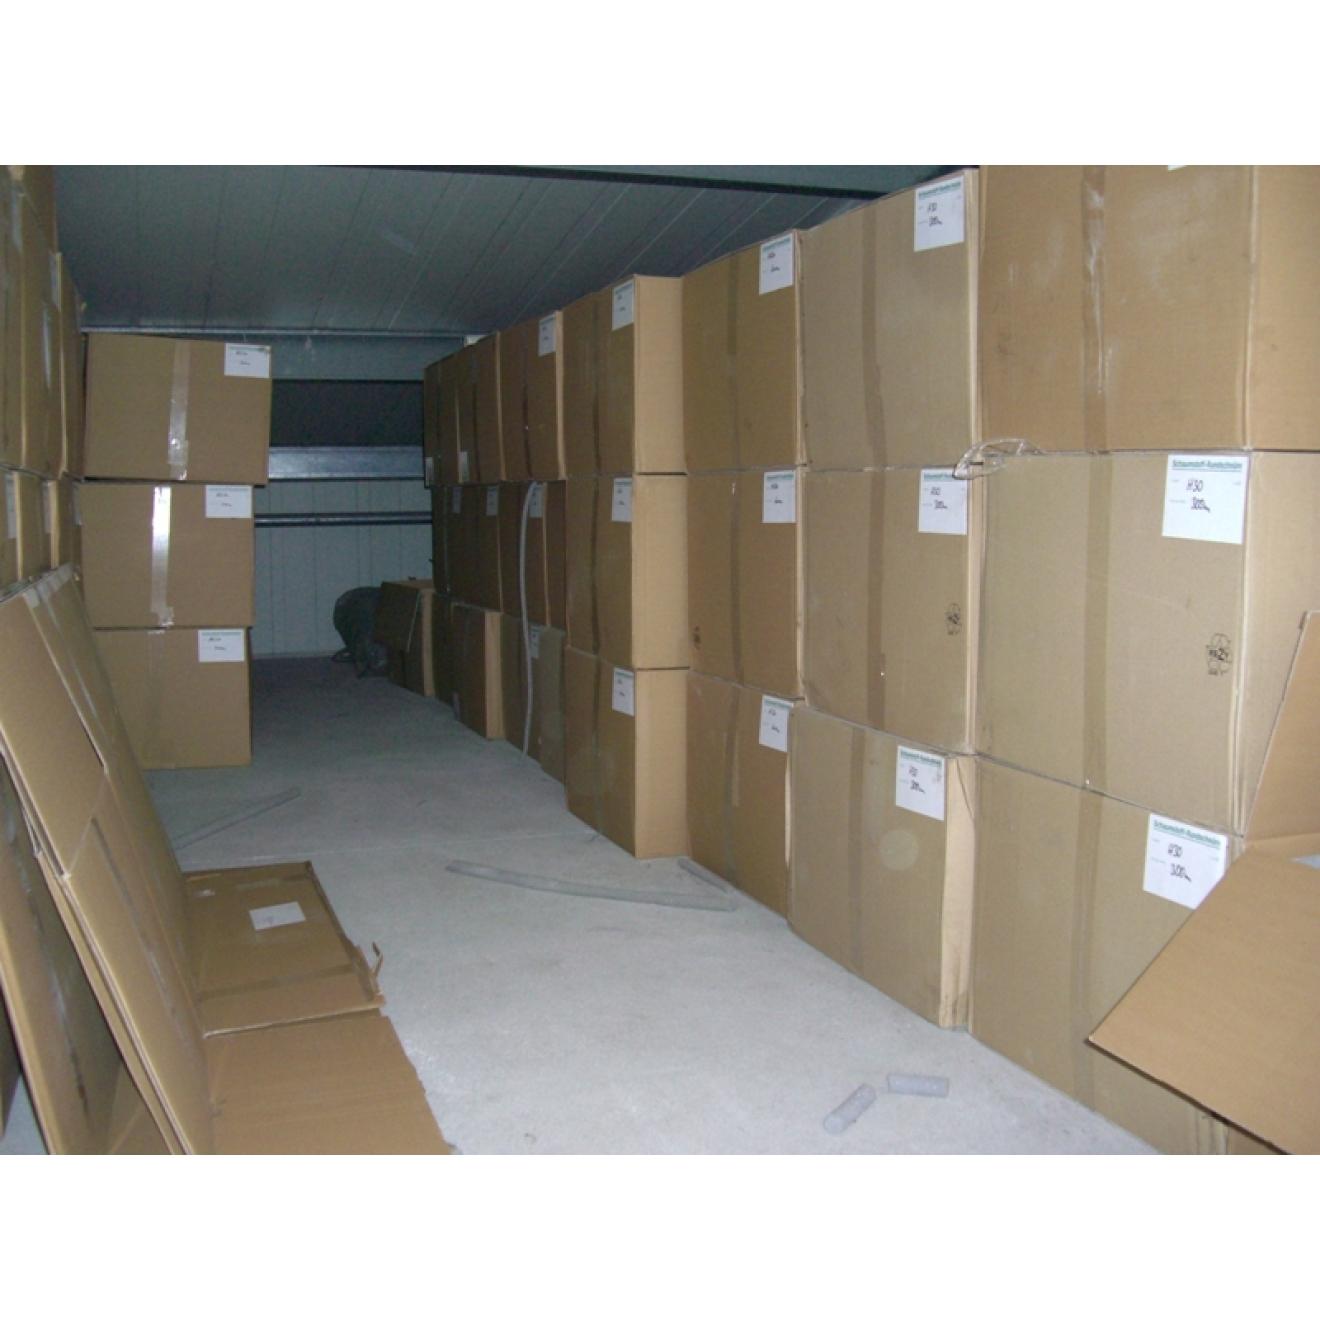 pe rundschn re b2 f llschnur f r silikon dichtstoffe hier im shop. Black Bedroom Furniture Sets. Home Design Ideas